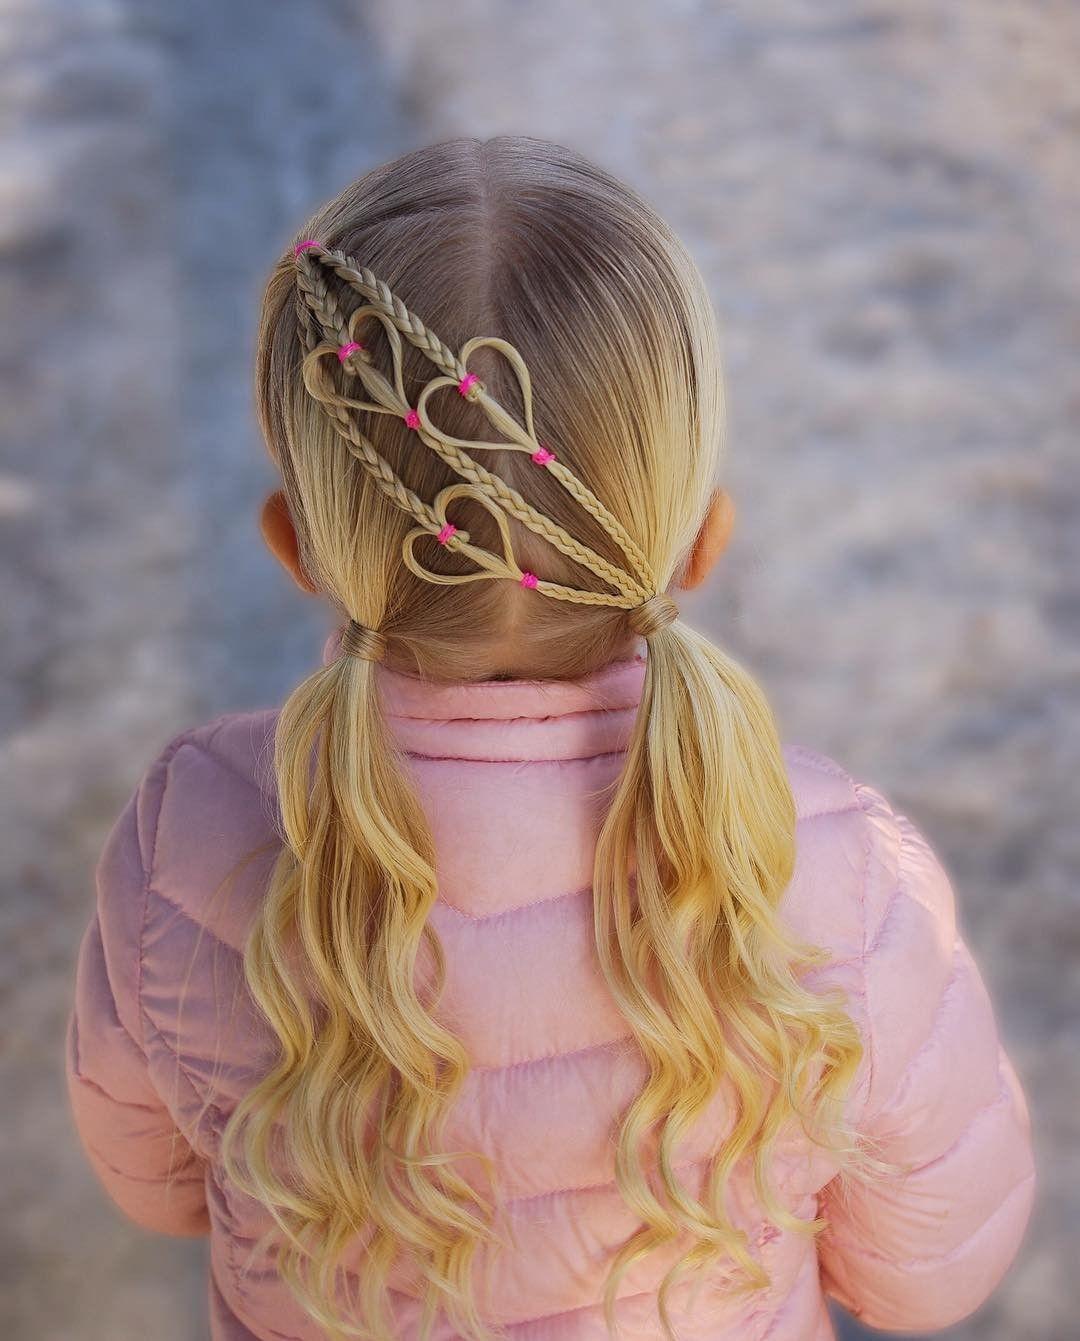 Pin by shulamit cohen caspi on hair style pinterest heart braid